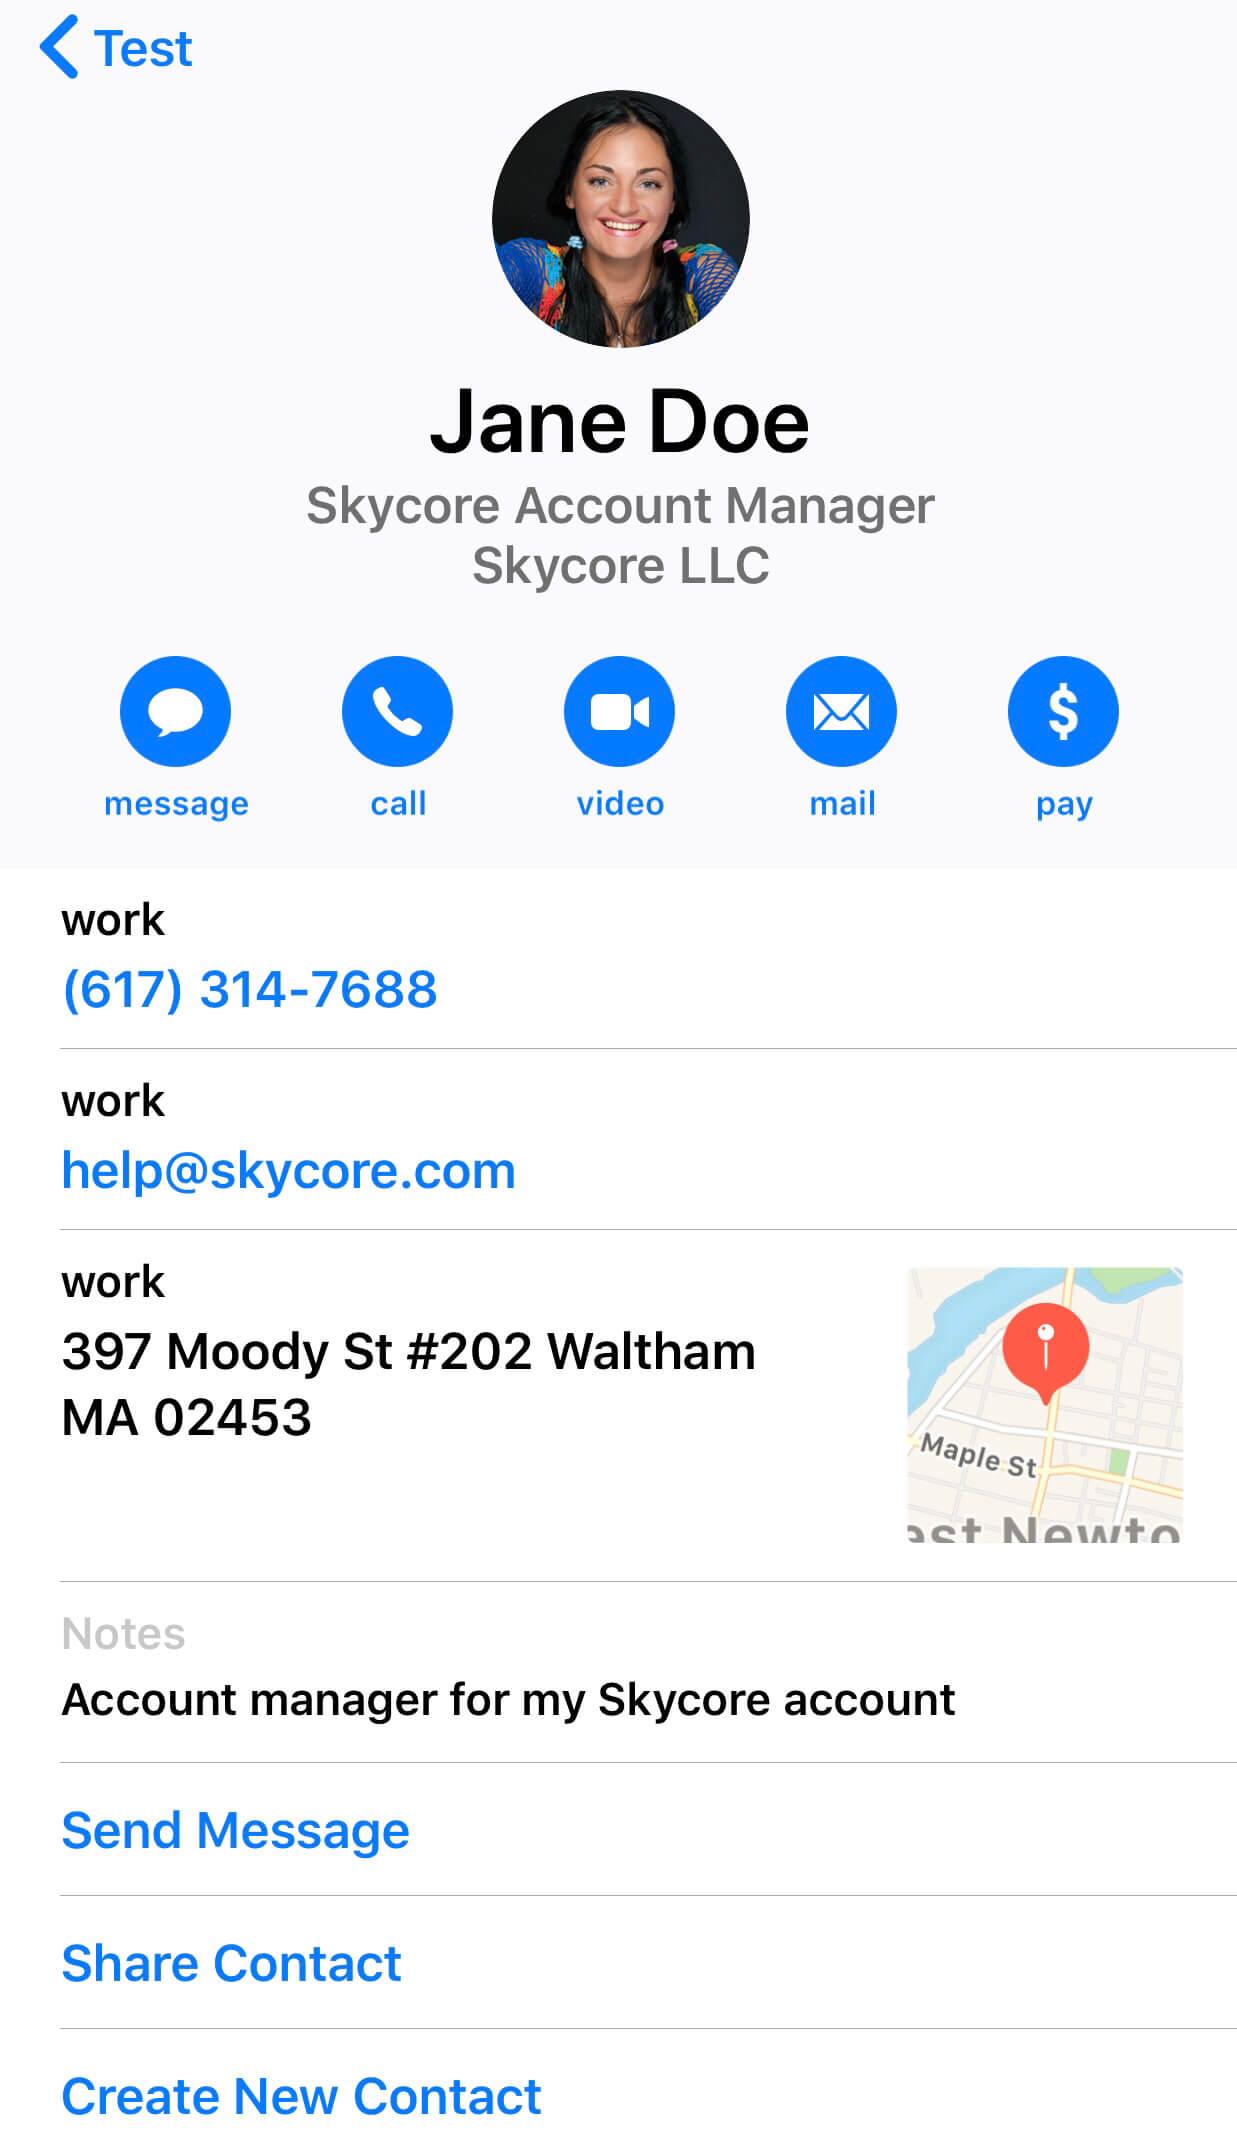 Digital business card viewed on IOS